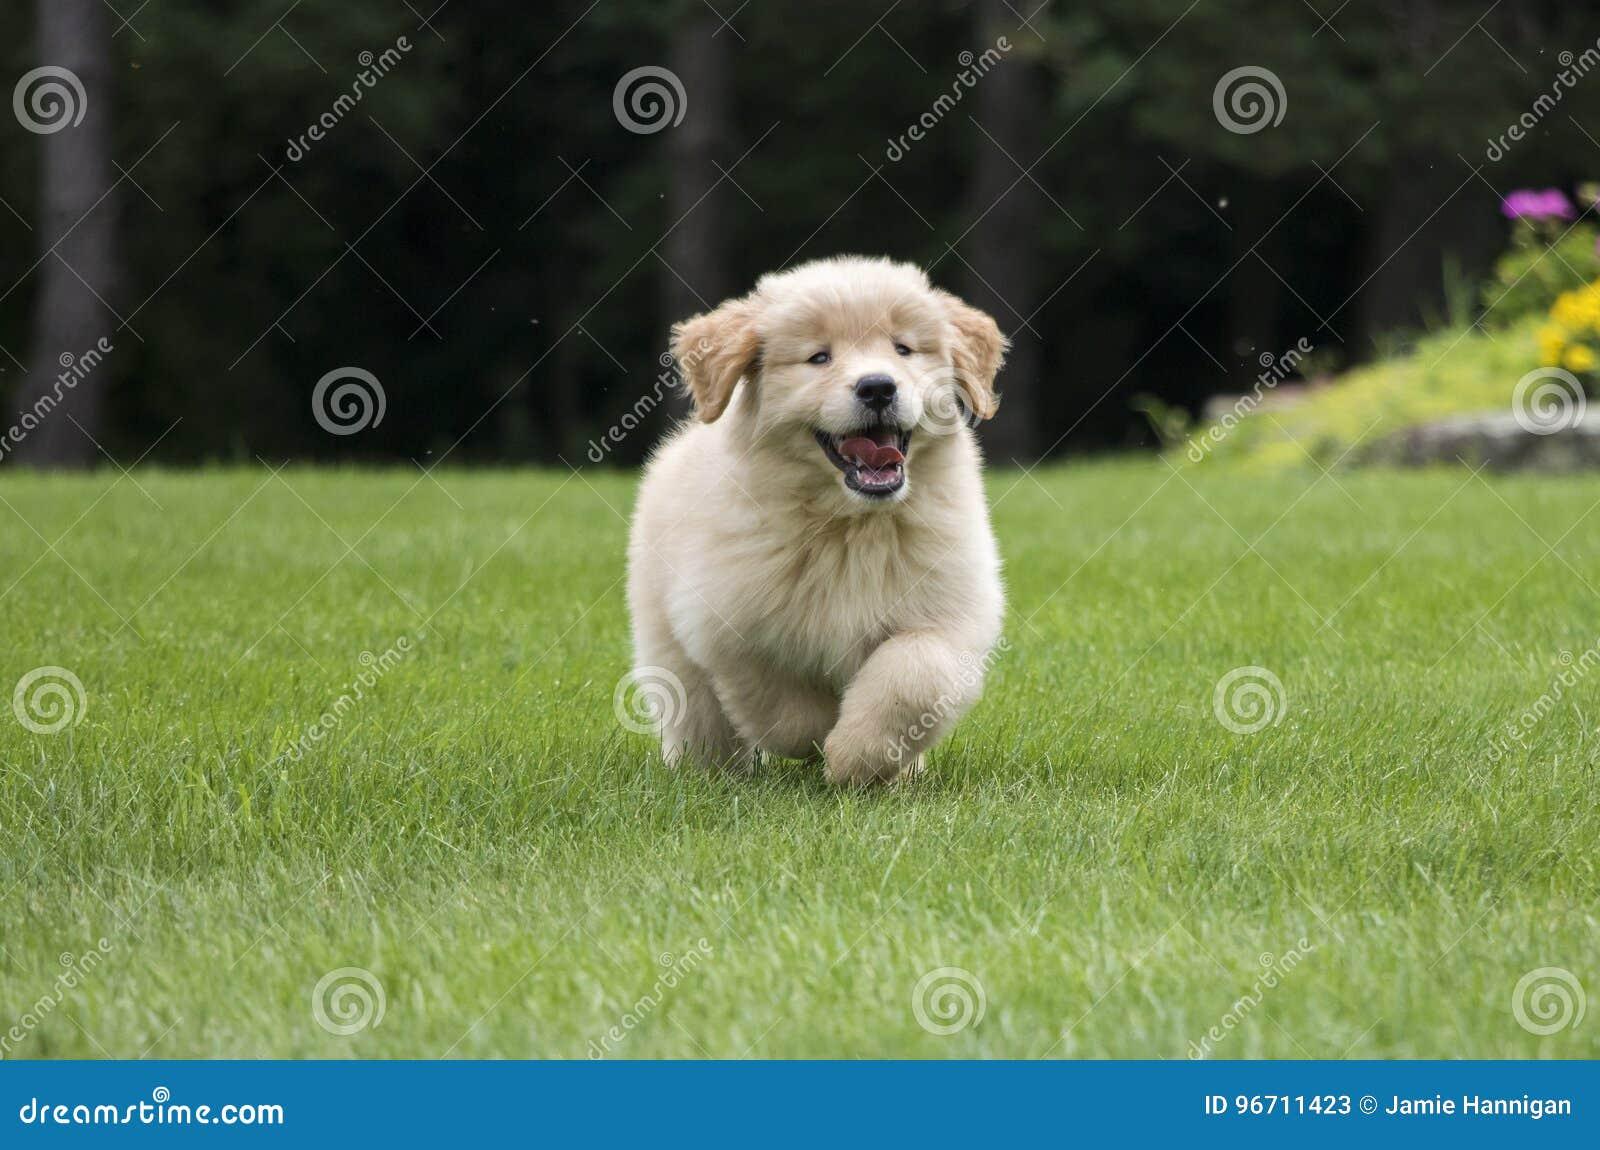 Happy Golden Retriever Puppy Running Stock Image Image Of Grass